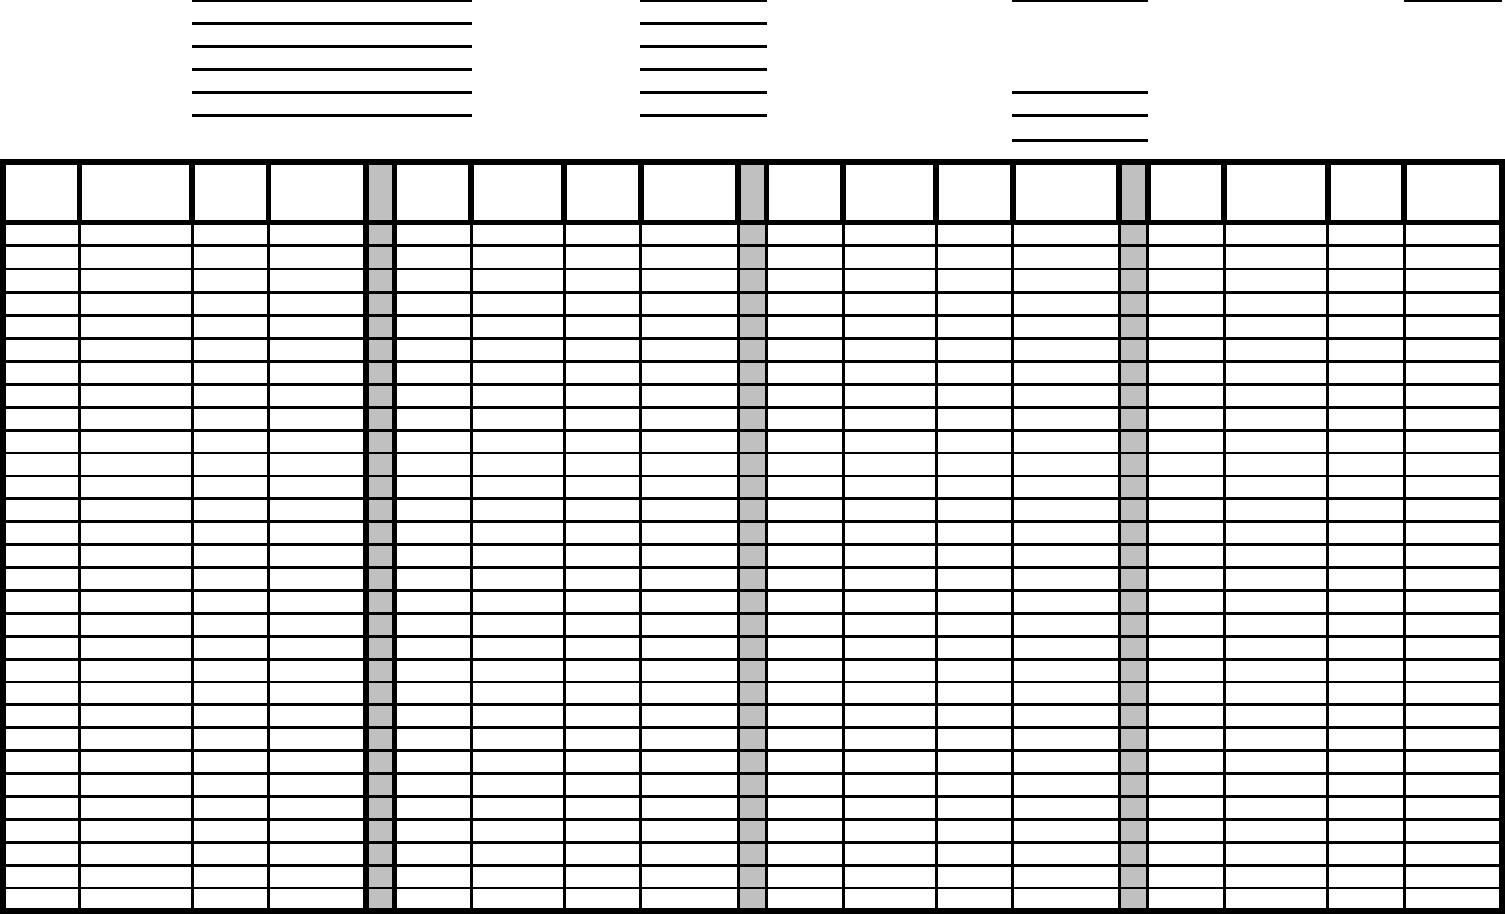 Pipe Tally Spreadsheet